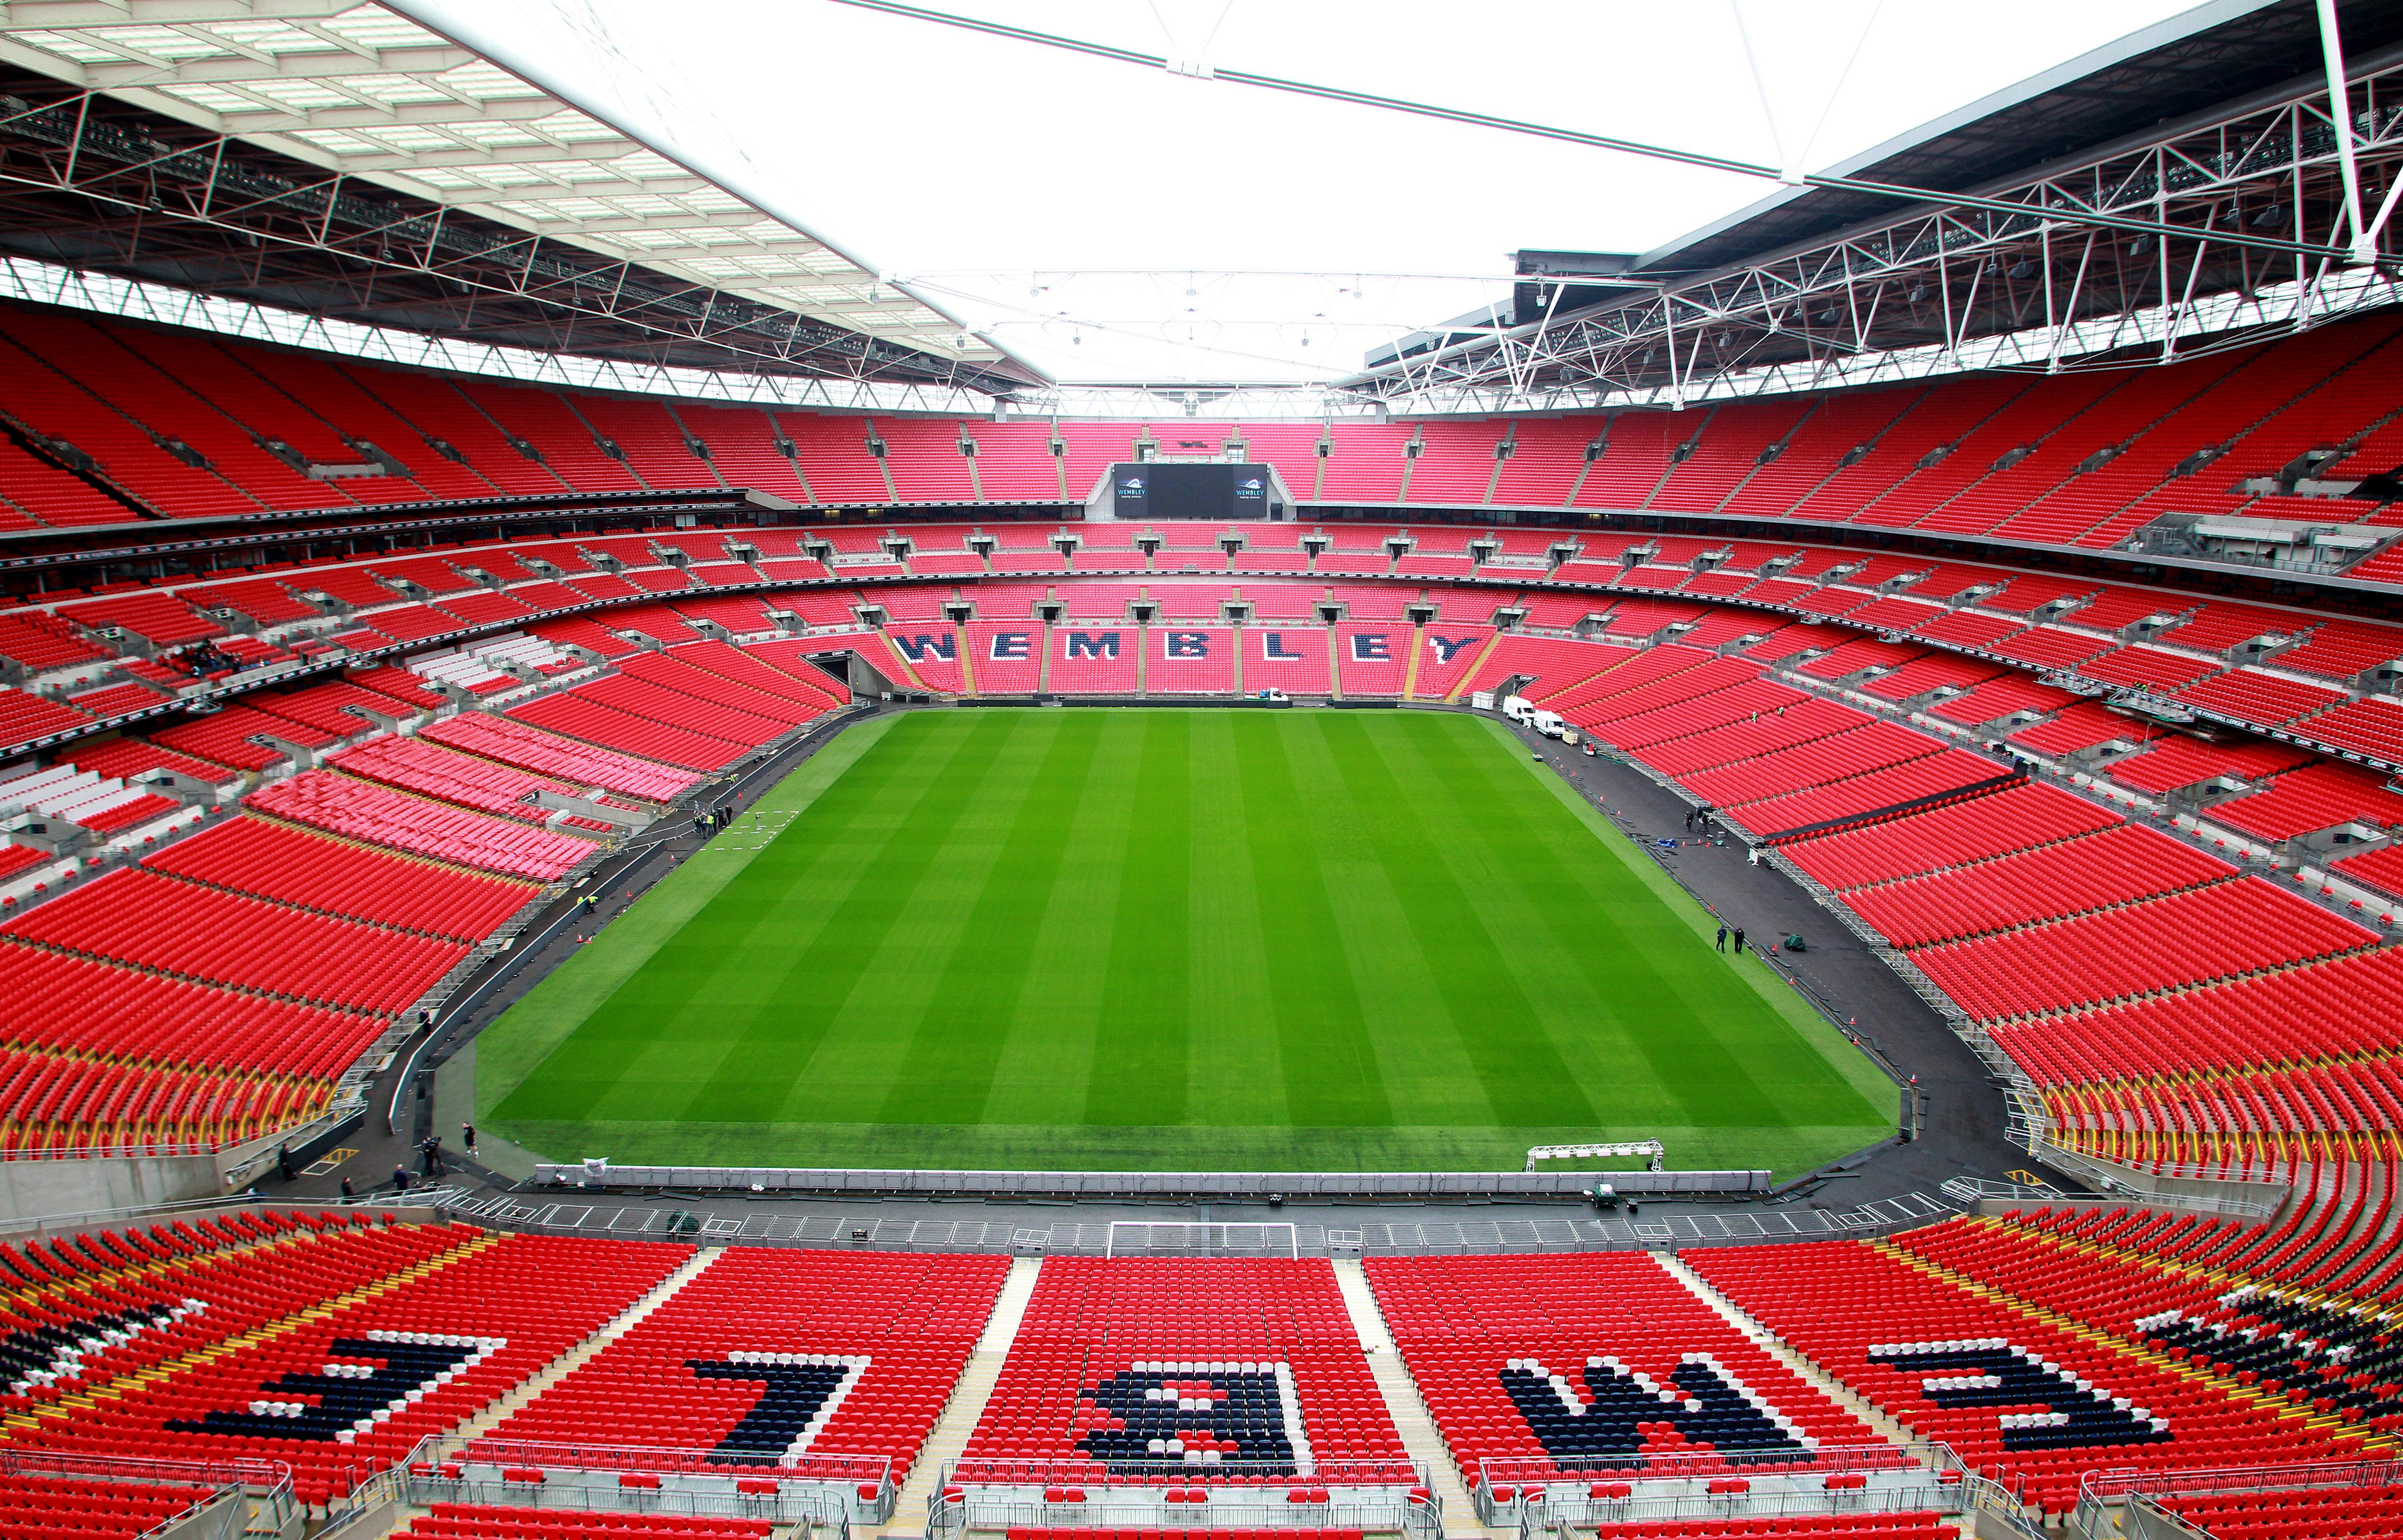 Things to do at Wembley Stadium